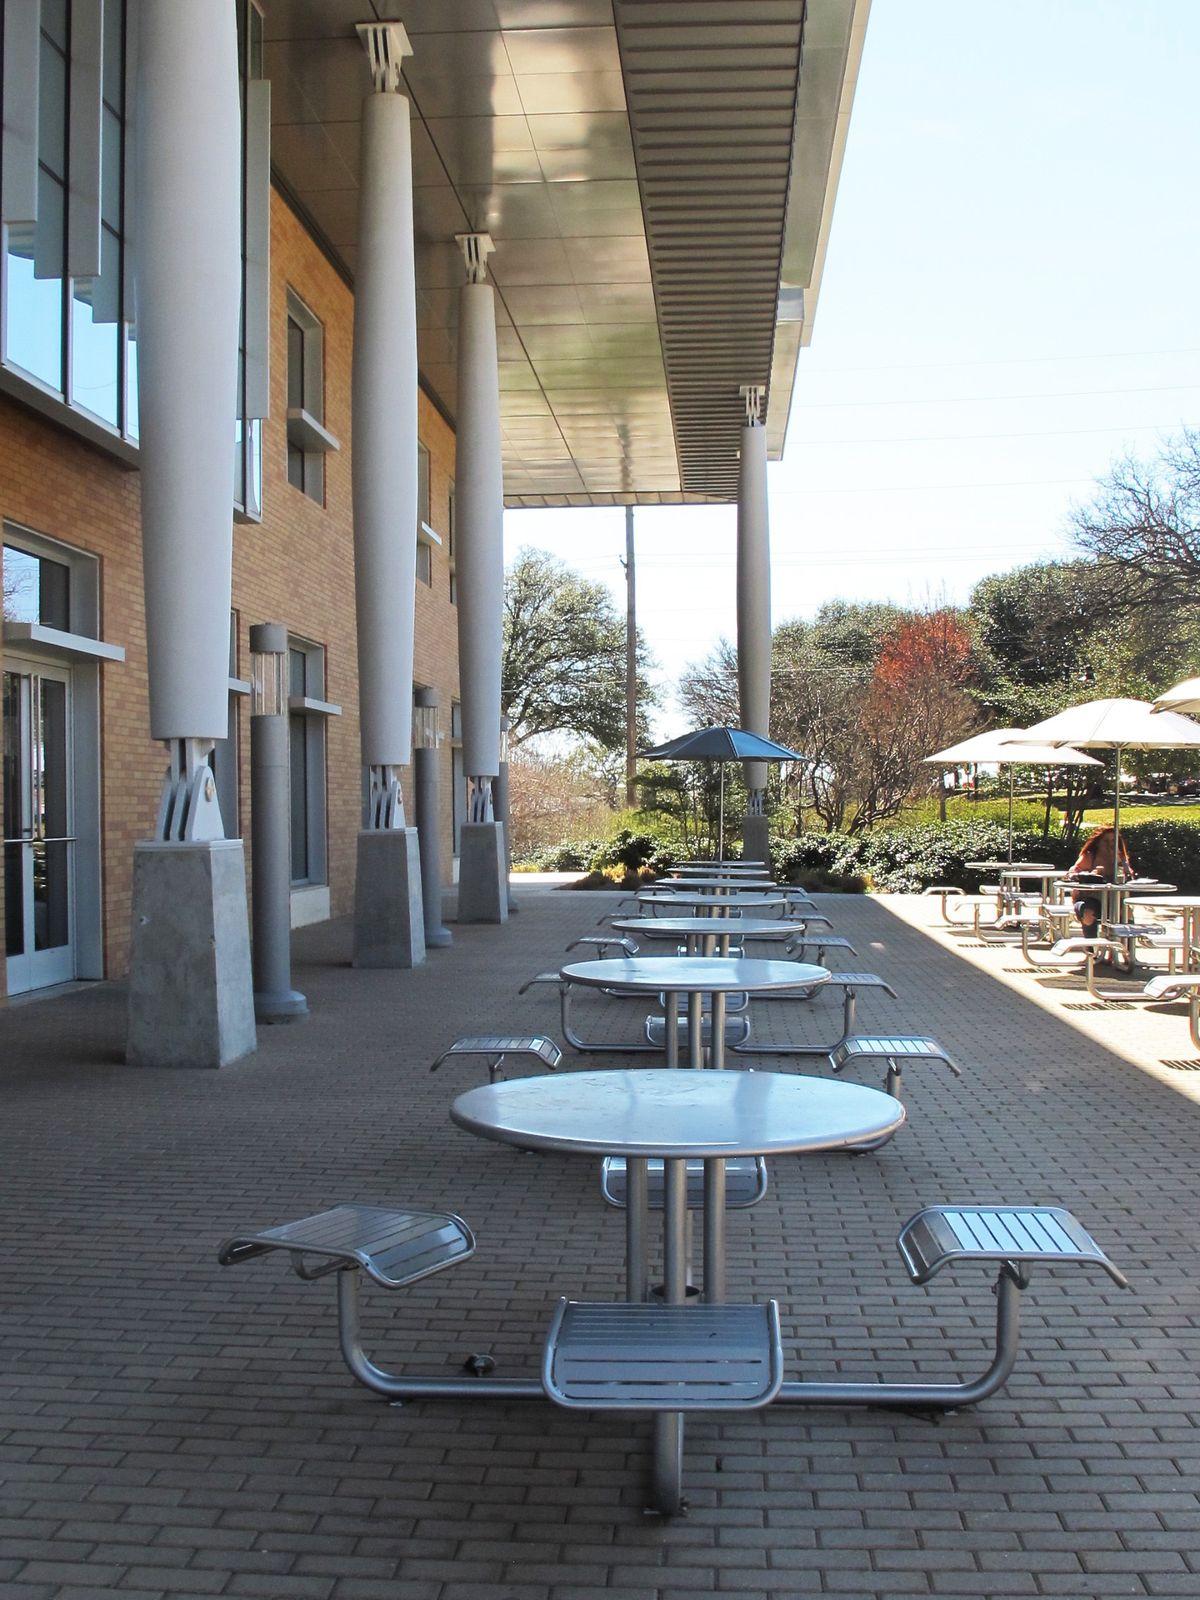 University of North Texas Schools Photo Video Shoot Location17.jpg